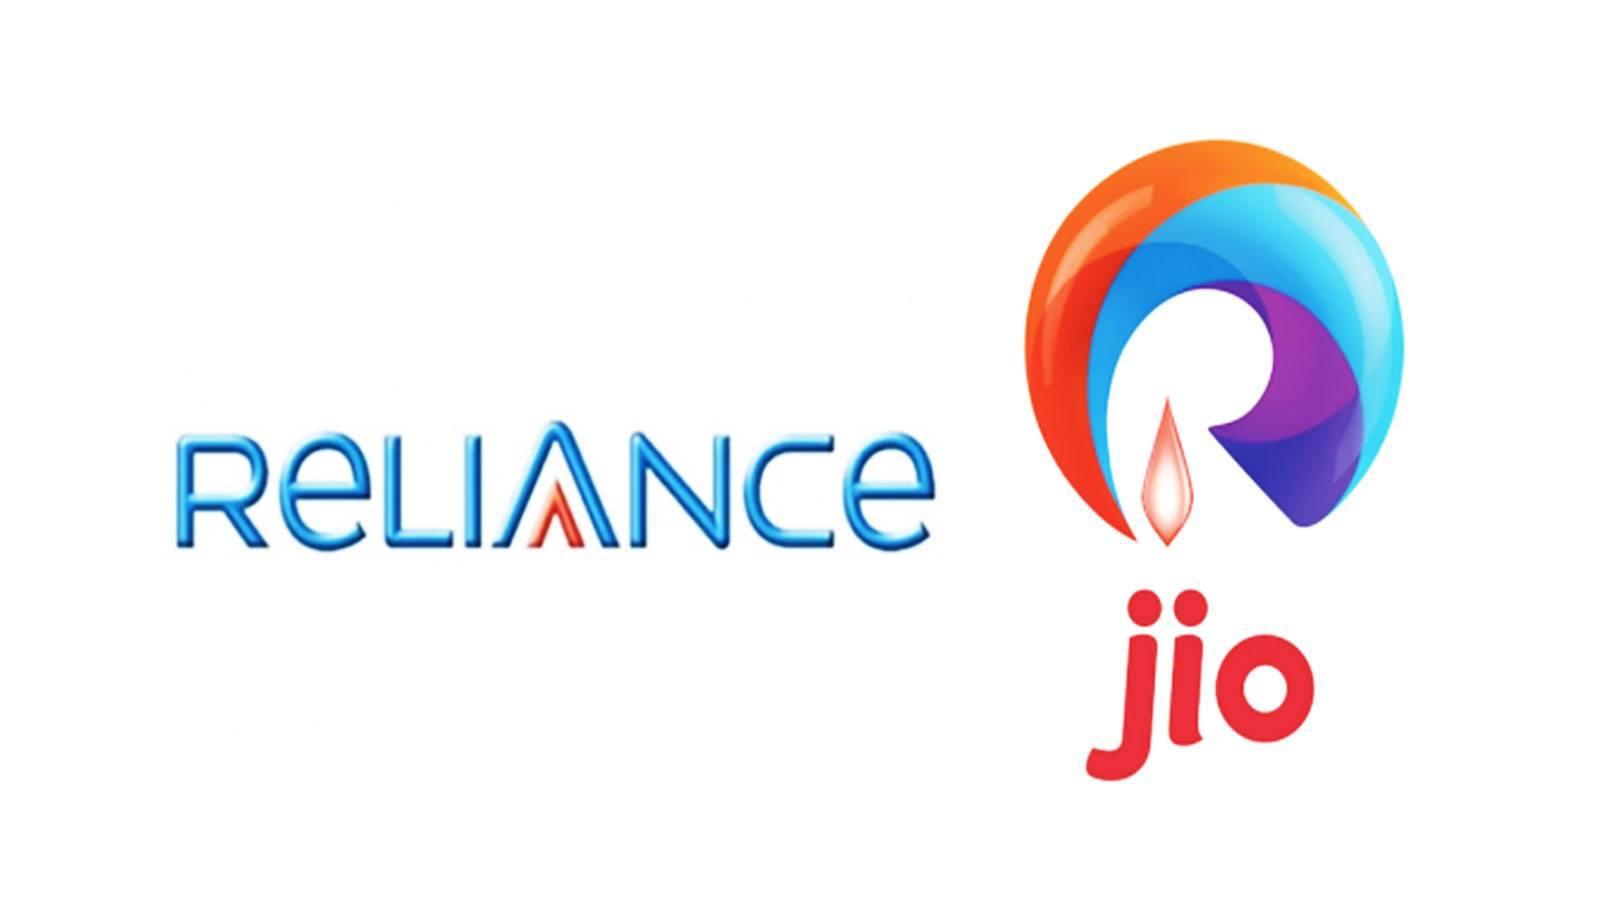 SWOT analysis of Reliance jio - 3